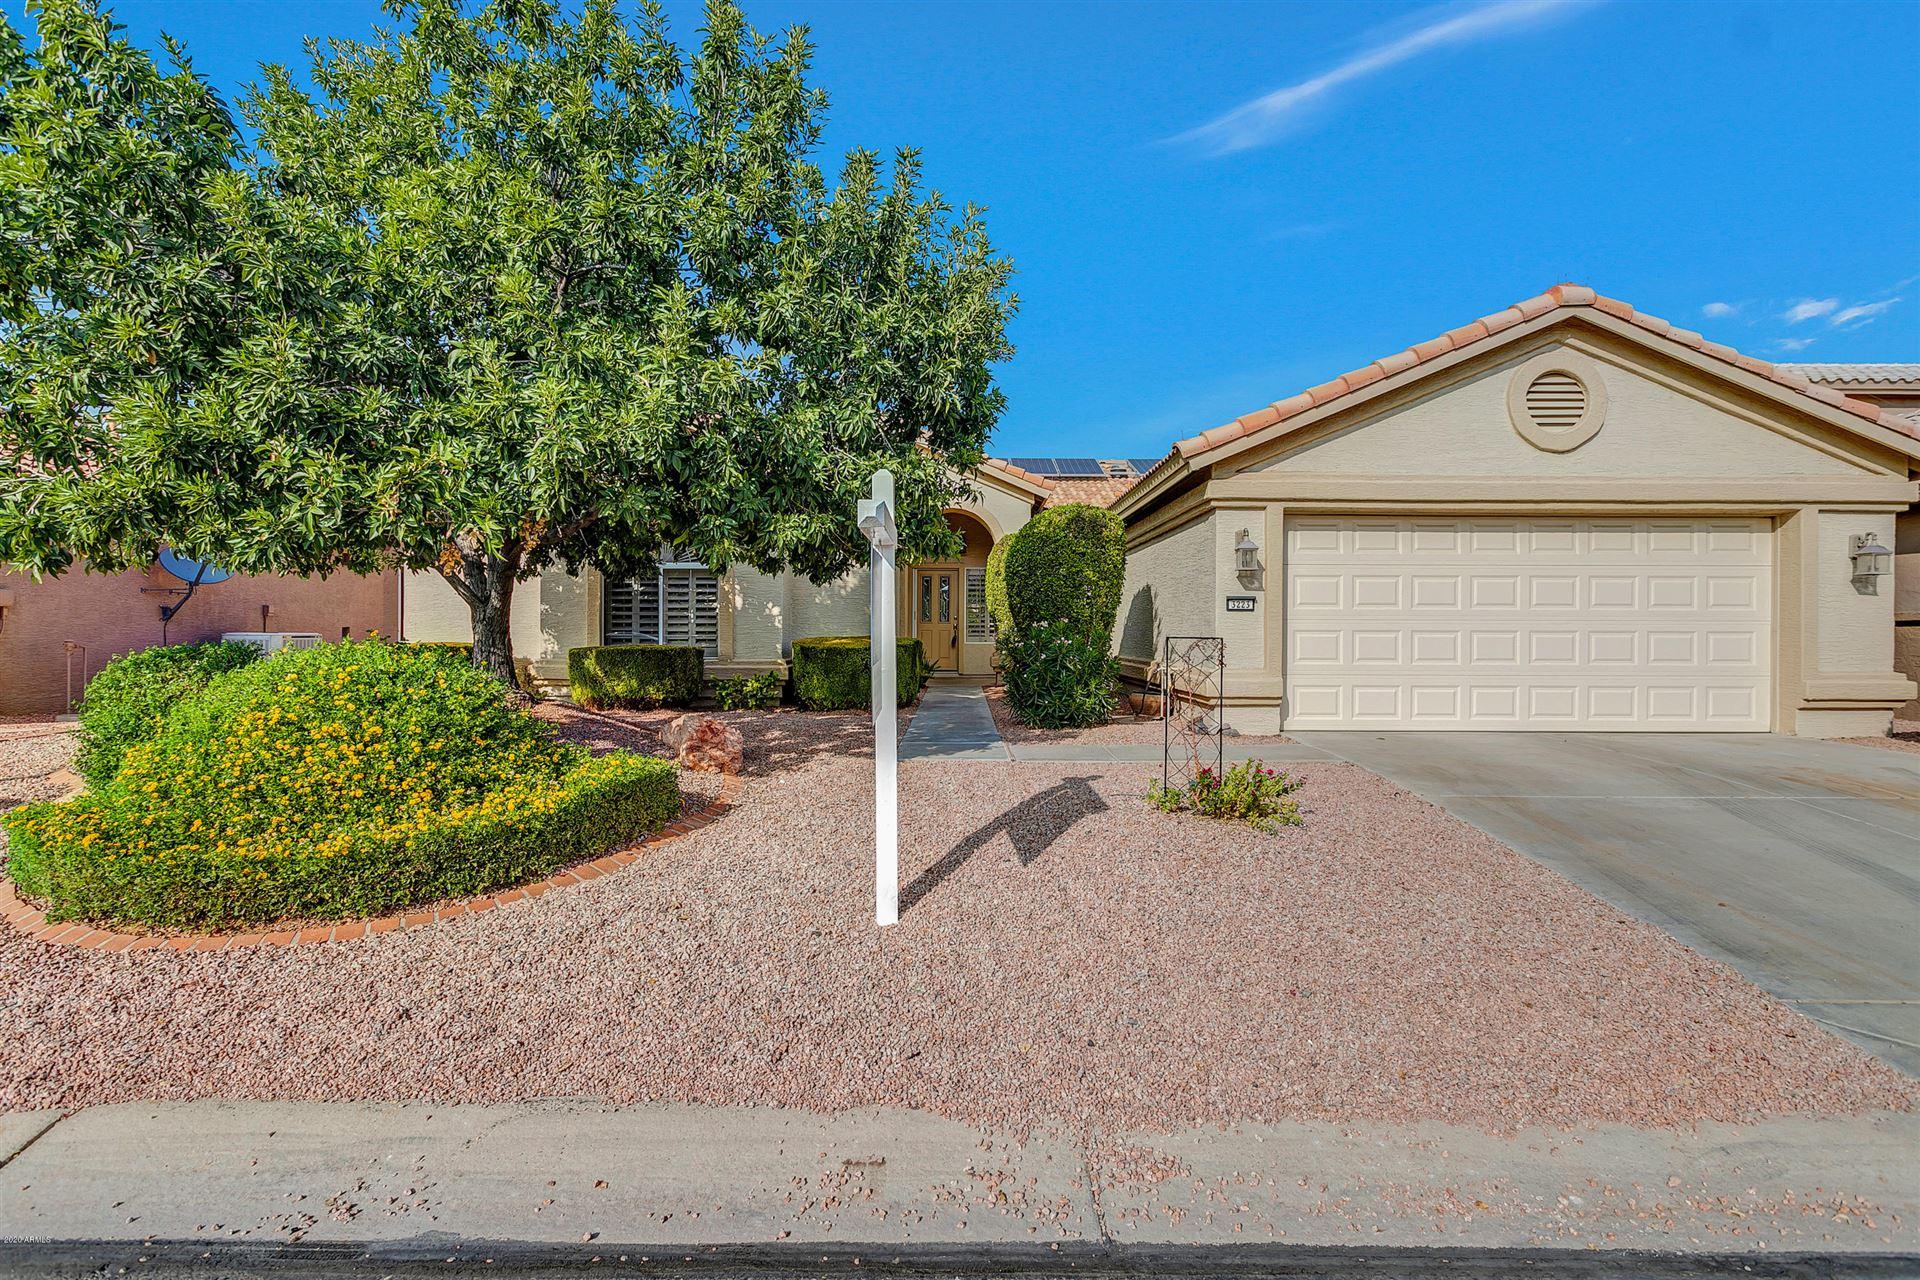 3223 N COUPLES Drive, Goodyear, AZ 85395 - MLS#: 6121446